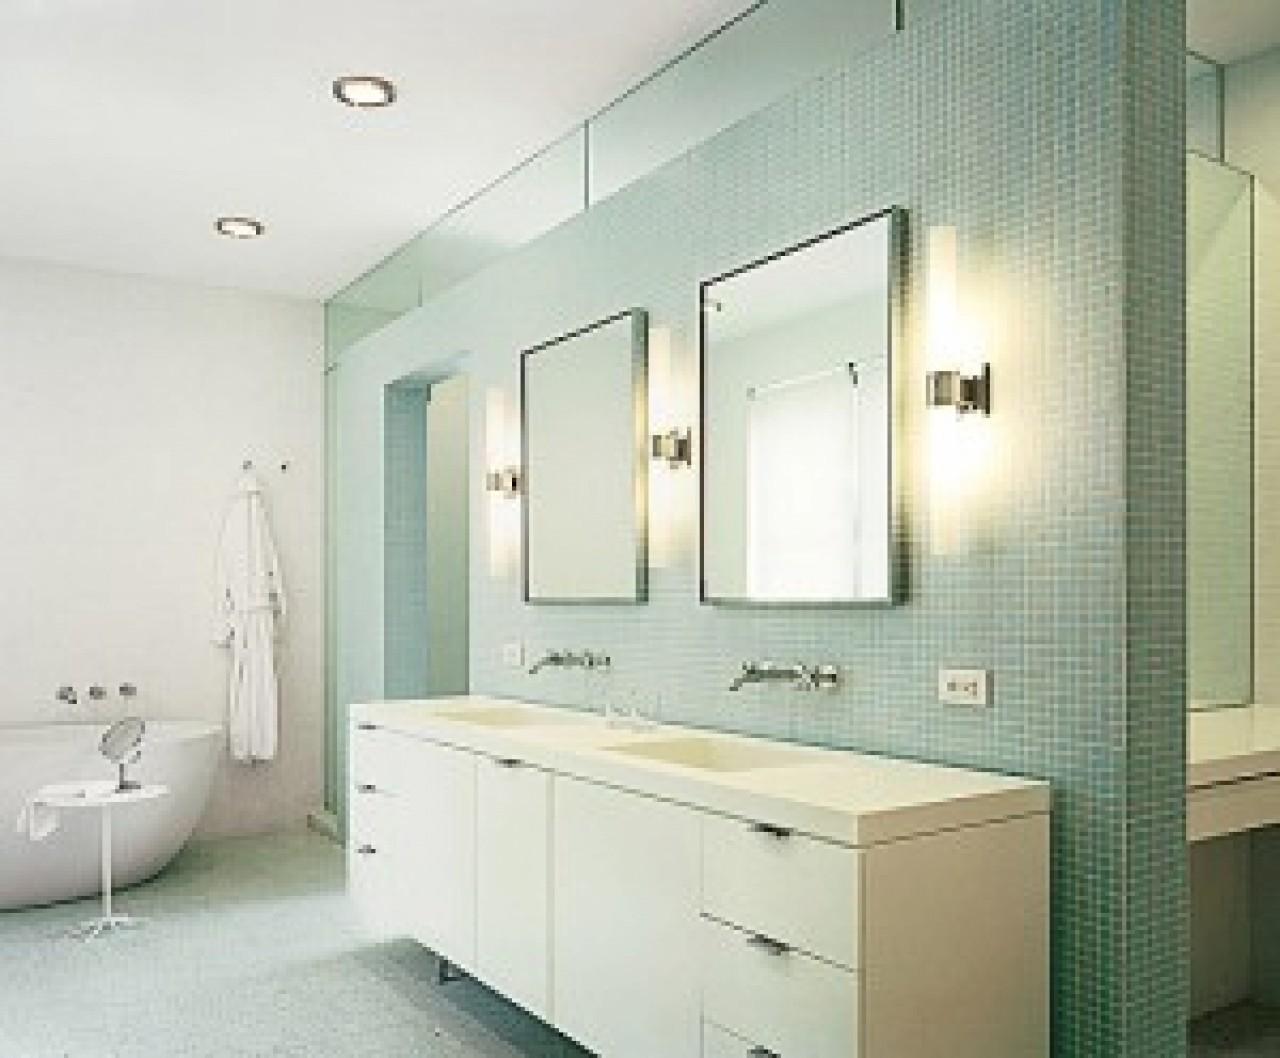 Brand New Bathroom Vanity Lighting Ideas That Will Inspire You With Ideas Look Fabulous Decoratorist